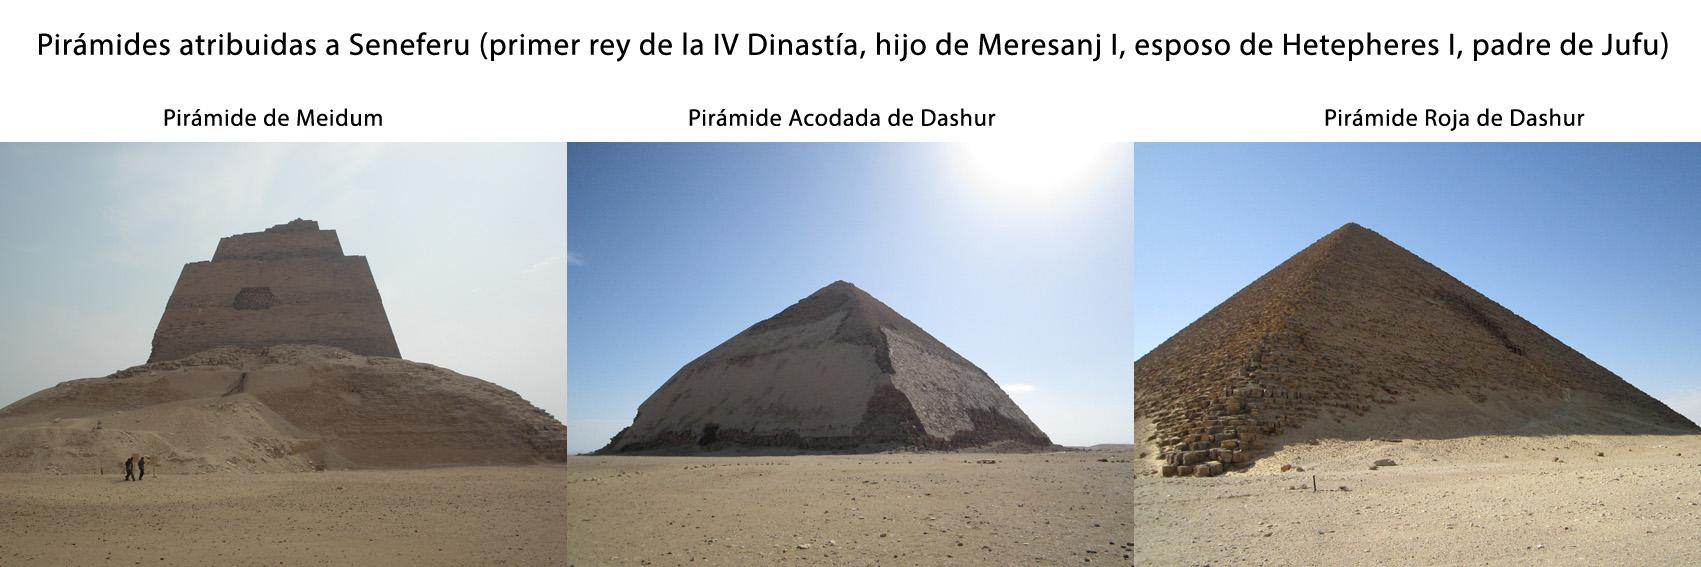 2-Piramides Seneferu Meidum y Dashur